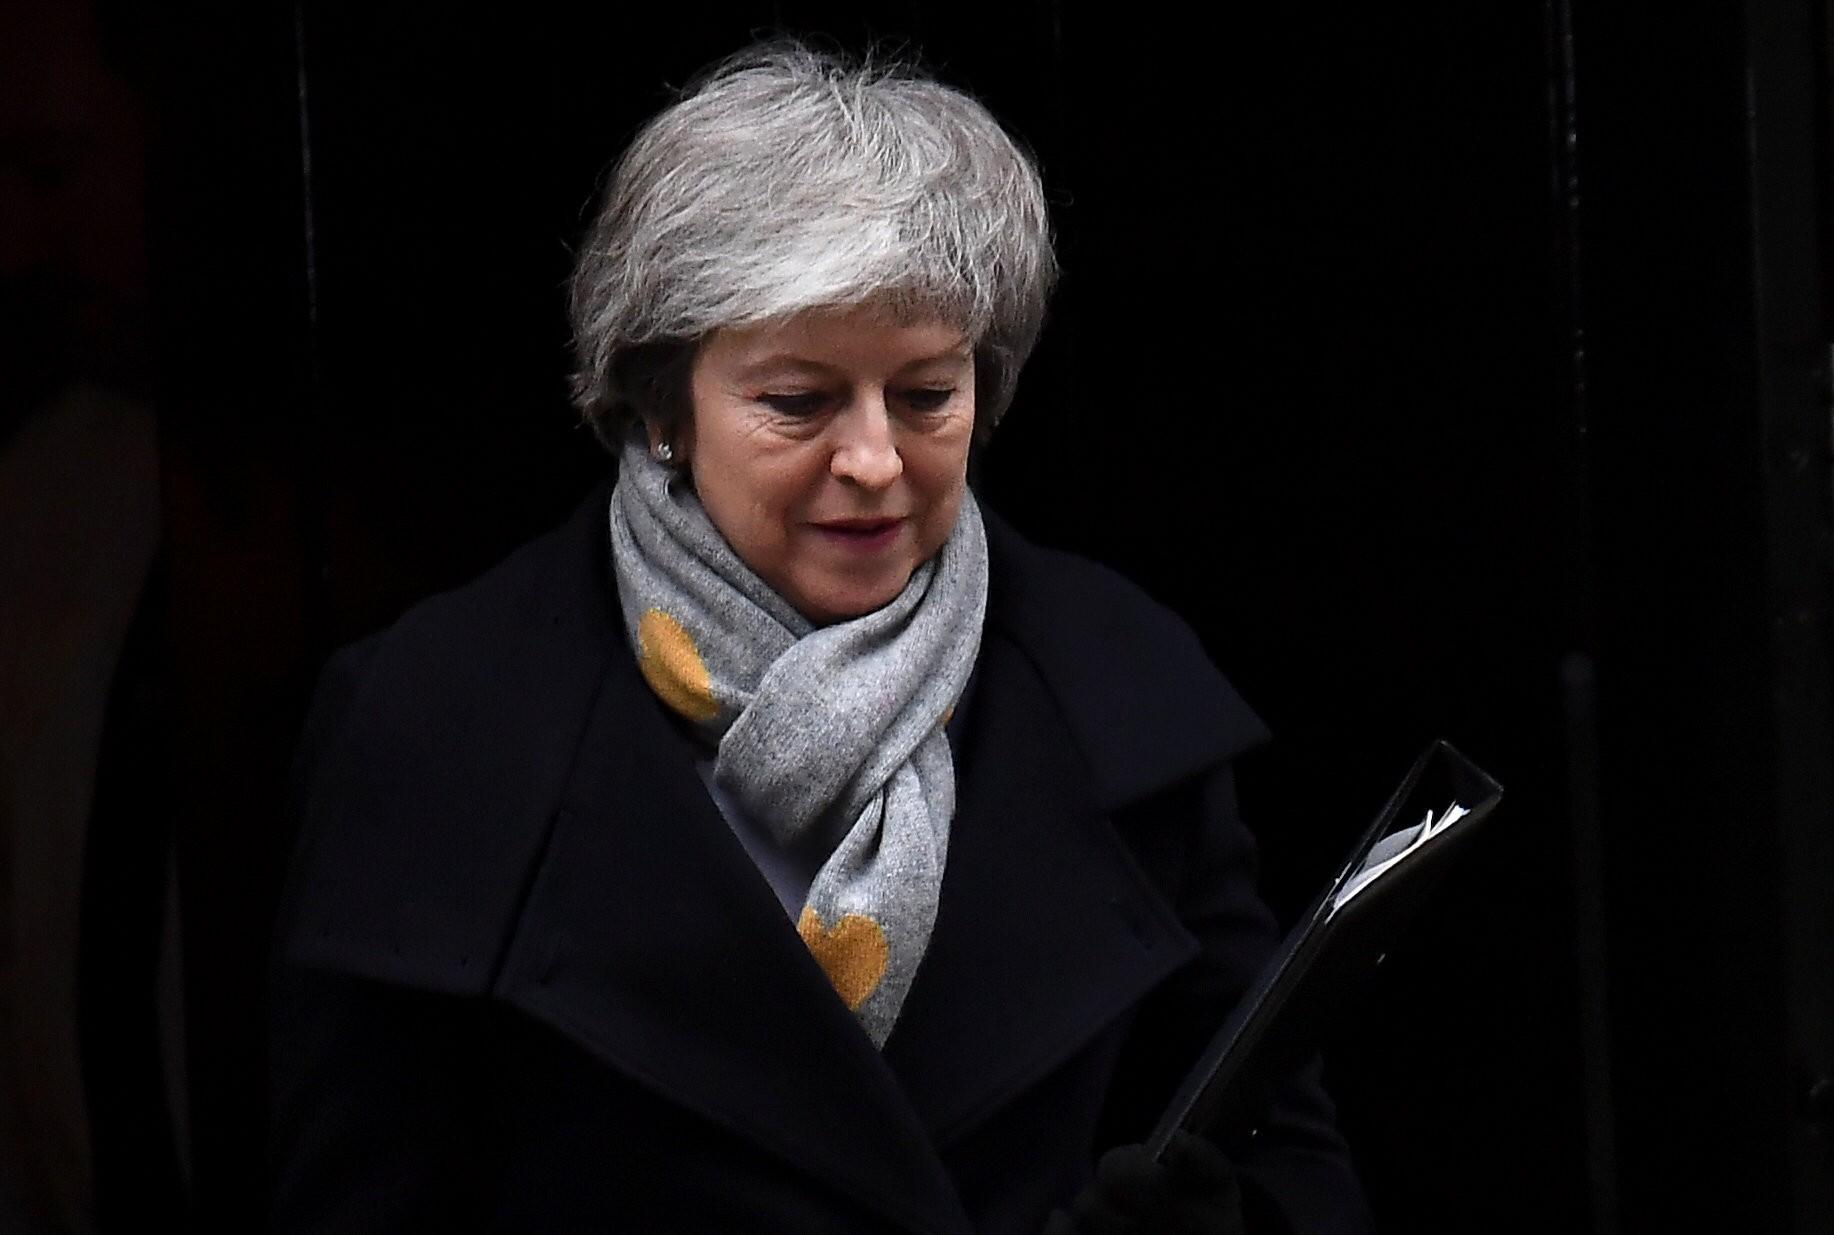 Britain's prime minister Theresa May (Photo: REUTERS/Clodagh Kilcoyne)